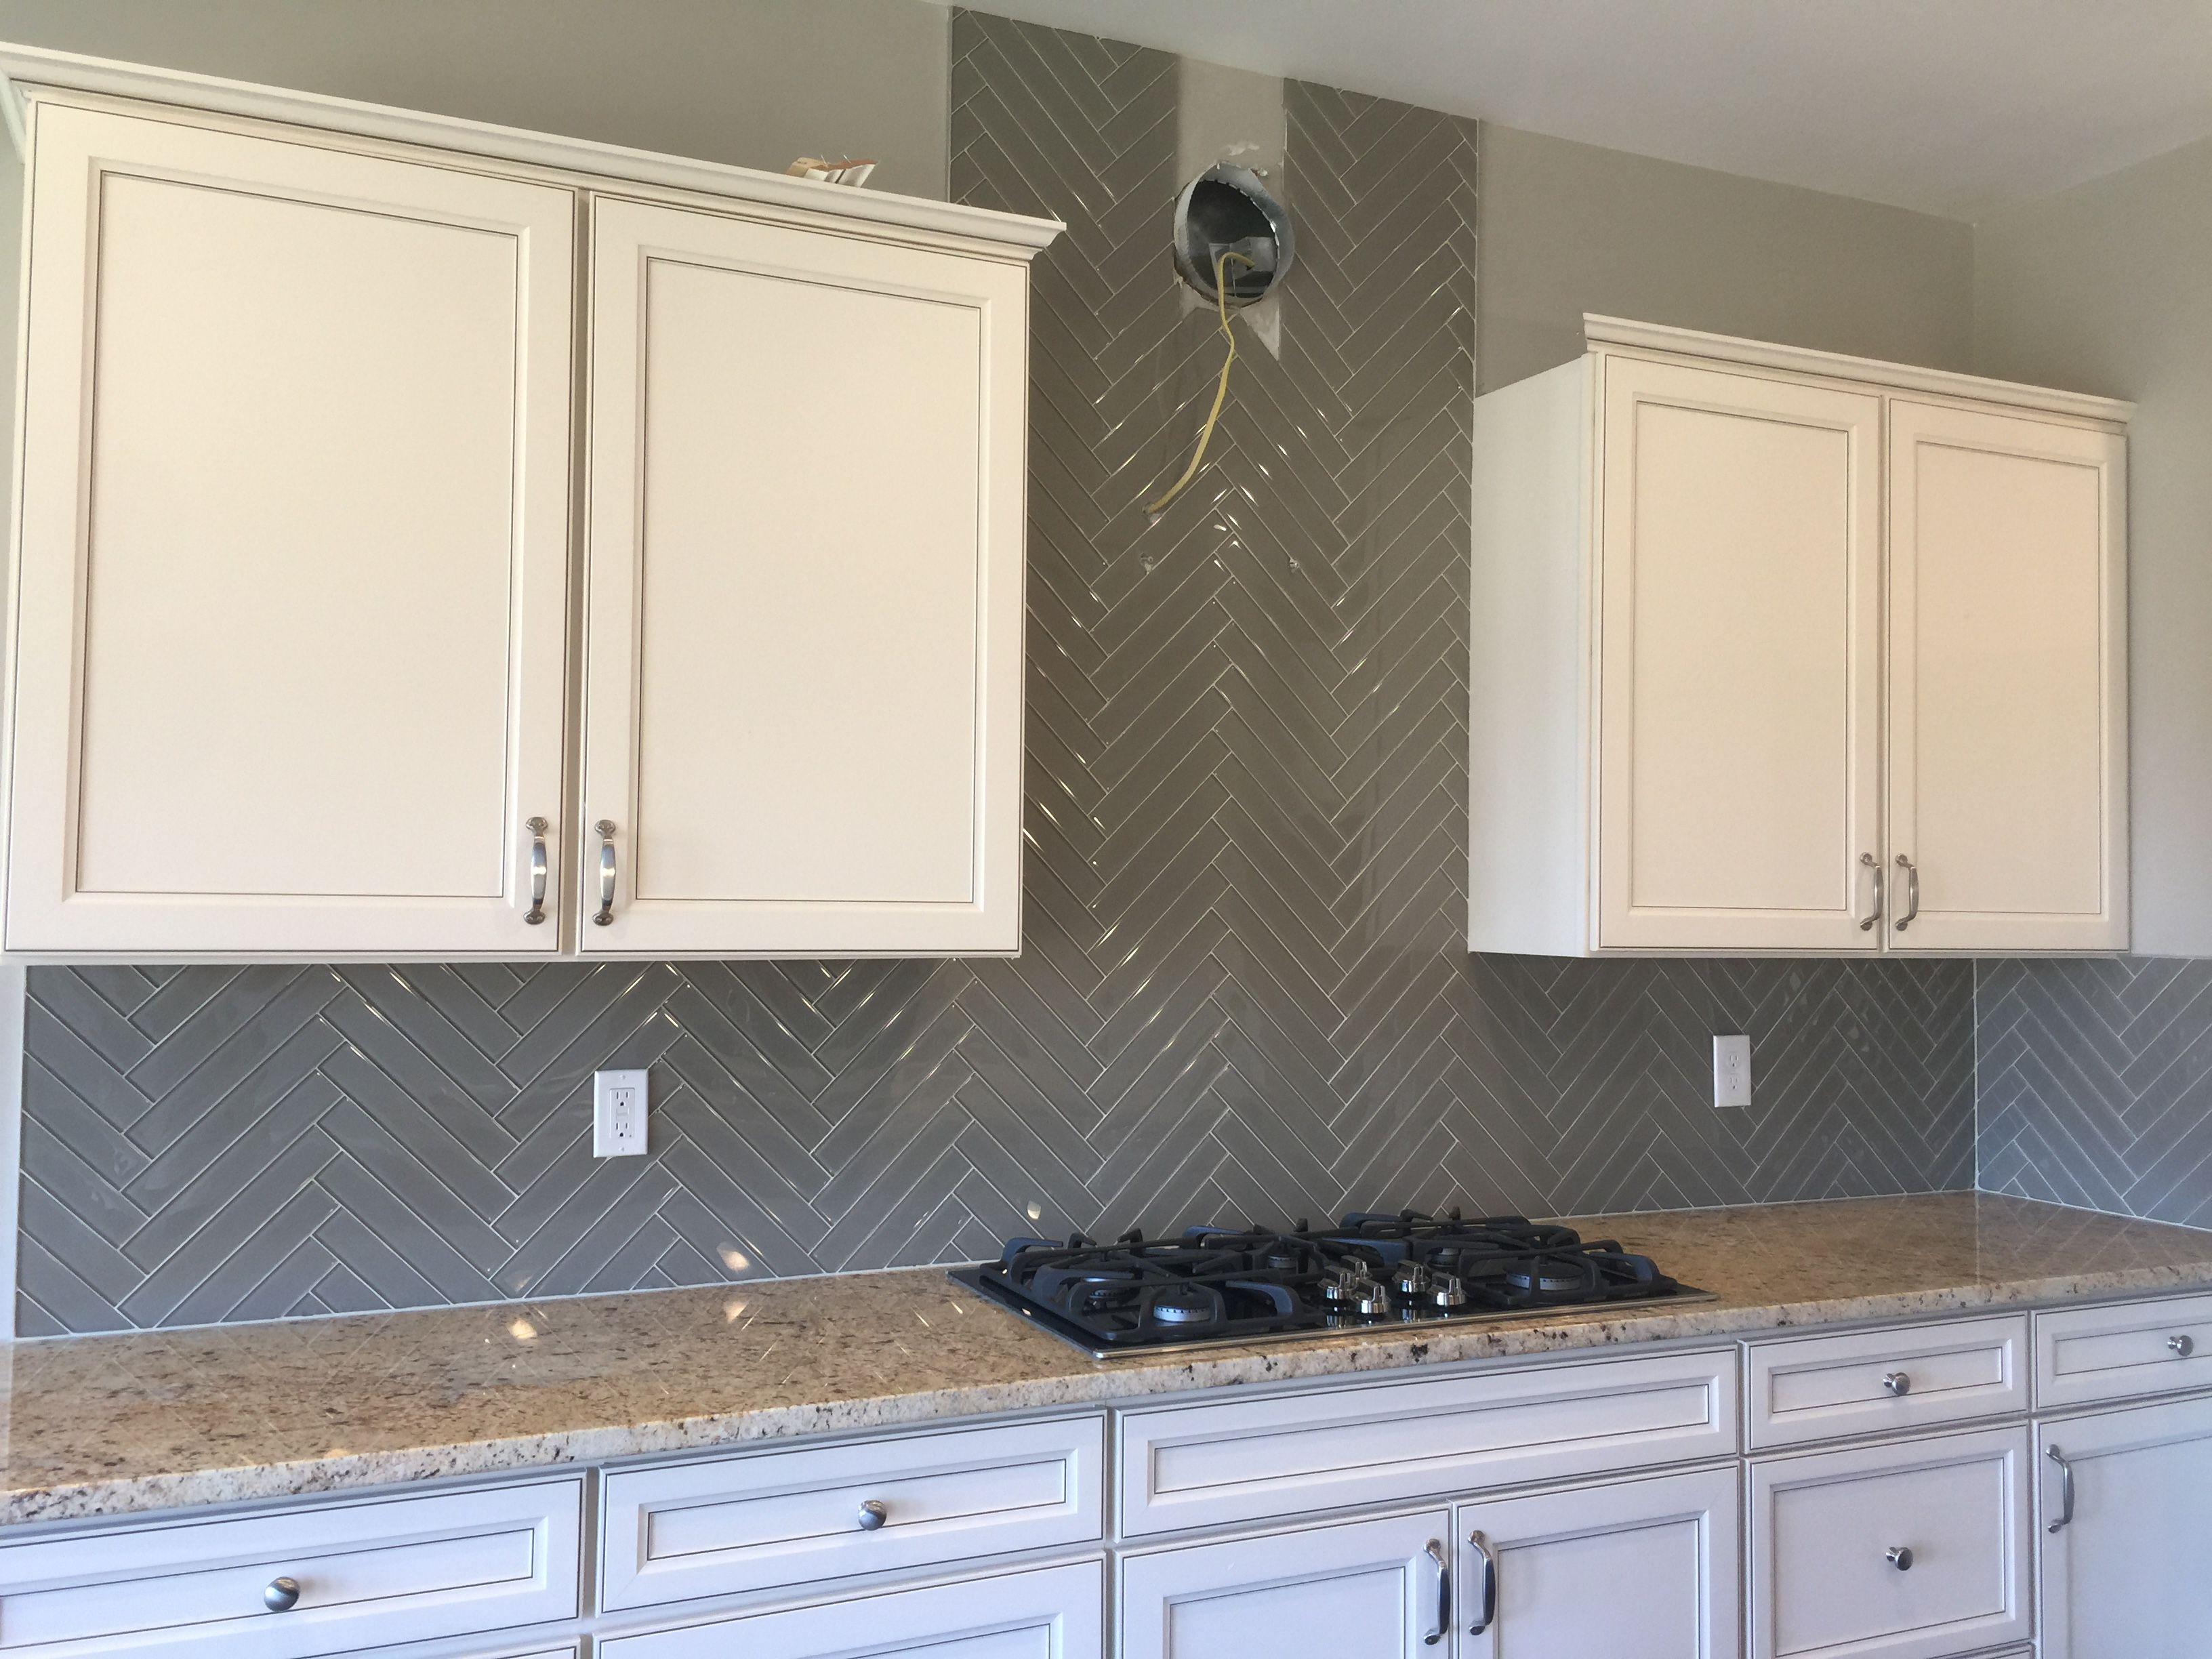 Magnificent 1 X 1 Acoustic Ceiling Tiles Thick 12X12 Ceramic Tile Regular 1950S Floor Tiles 2X2 Ceiling Tiles Lowes Youthful 2X4 Drop Ceiling Tiles Home Depot Black2X4 Glass Tile Backsplash COLOR WAVES 2X12 SILVER MINK BACKSPLASH TILES, INSTALLED HERRINGBONE ..